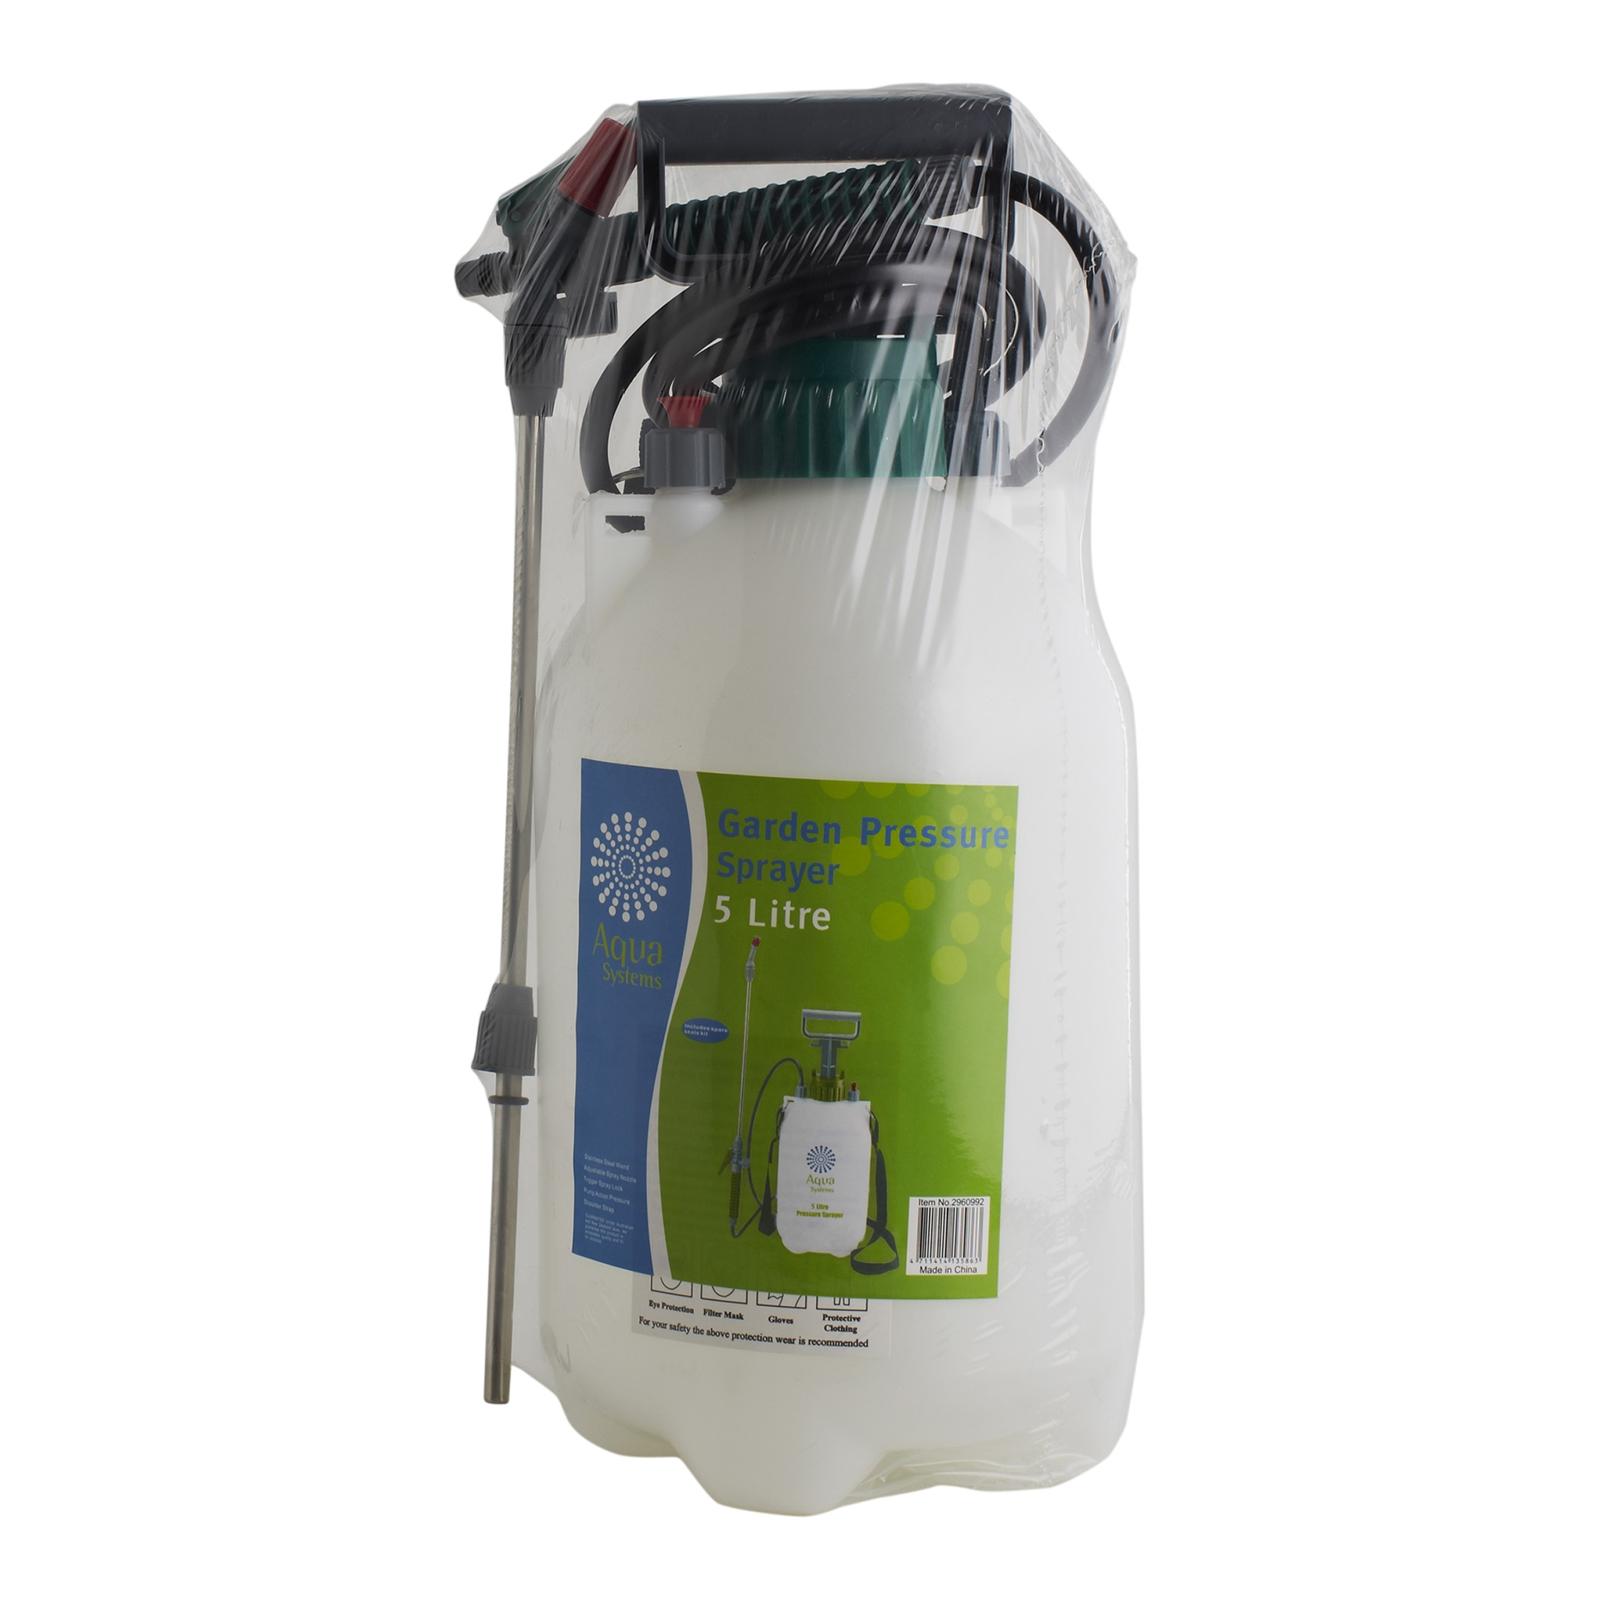 Aqua Systems 5l Garden Pressure Sprayer Kit Reviews